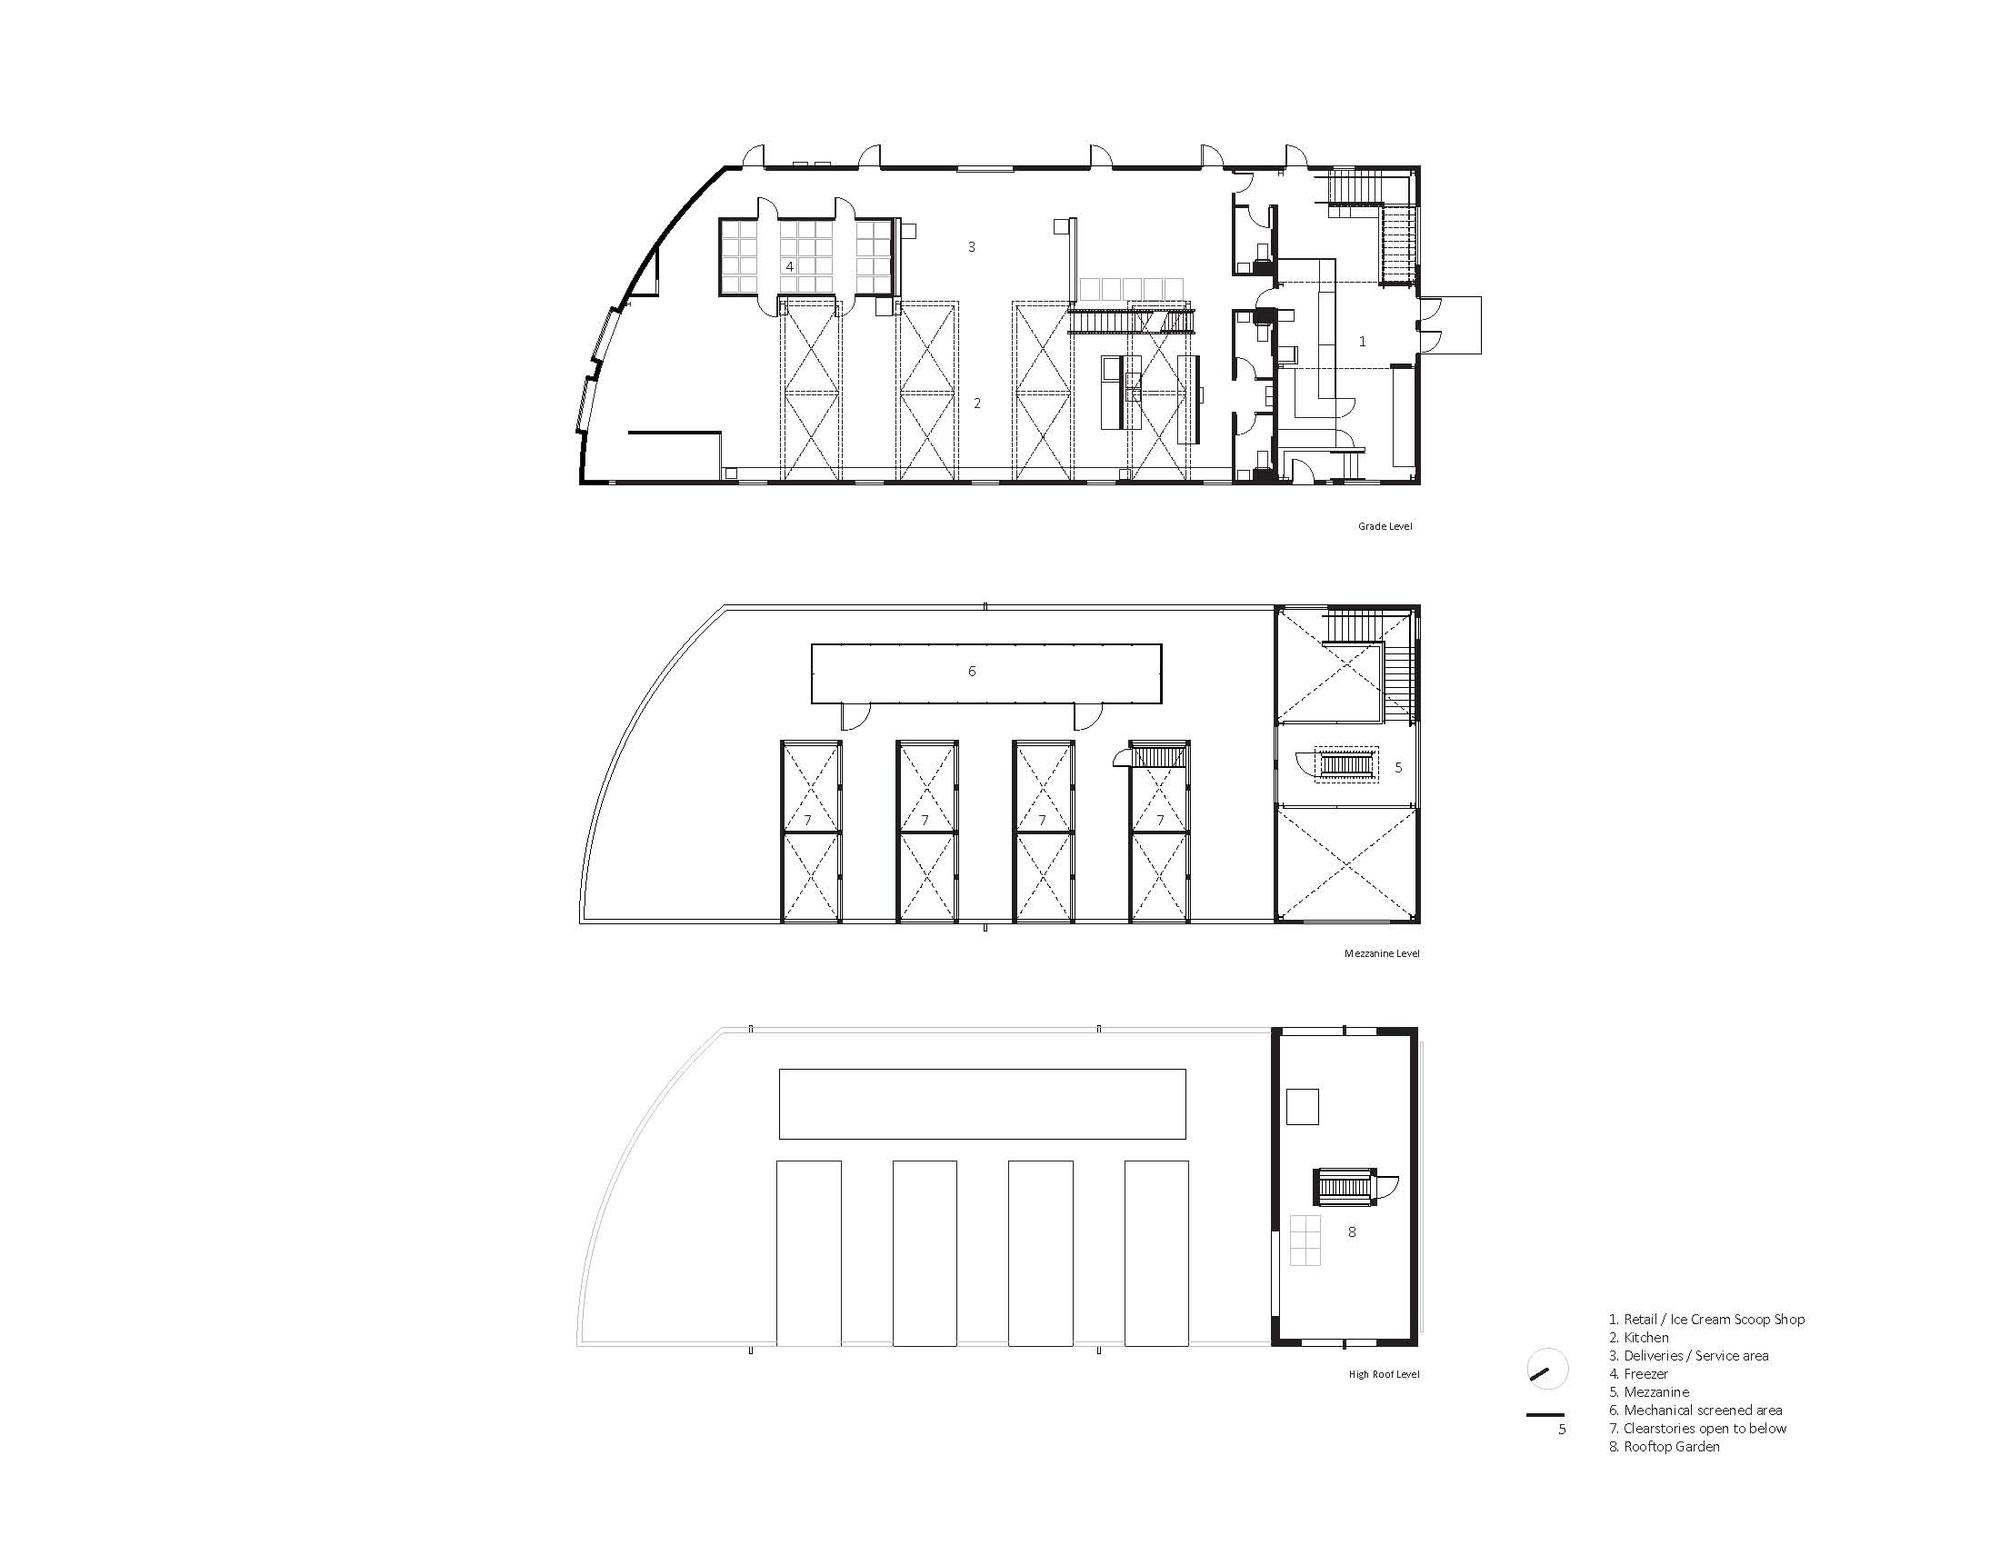 Izzyu0027s Ice Cream Kitchen U0026 Retail Shop / Salmela Architect. 32 / 36. Floor  Plan